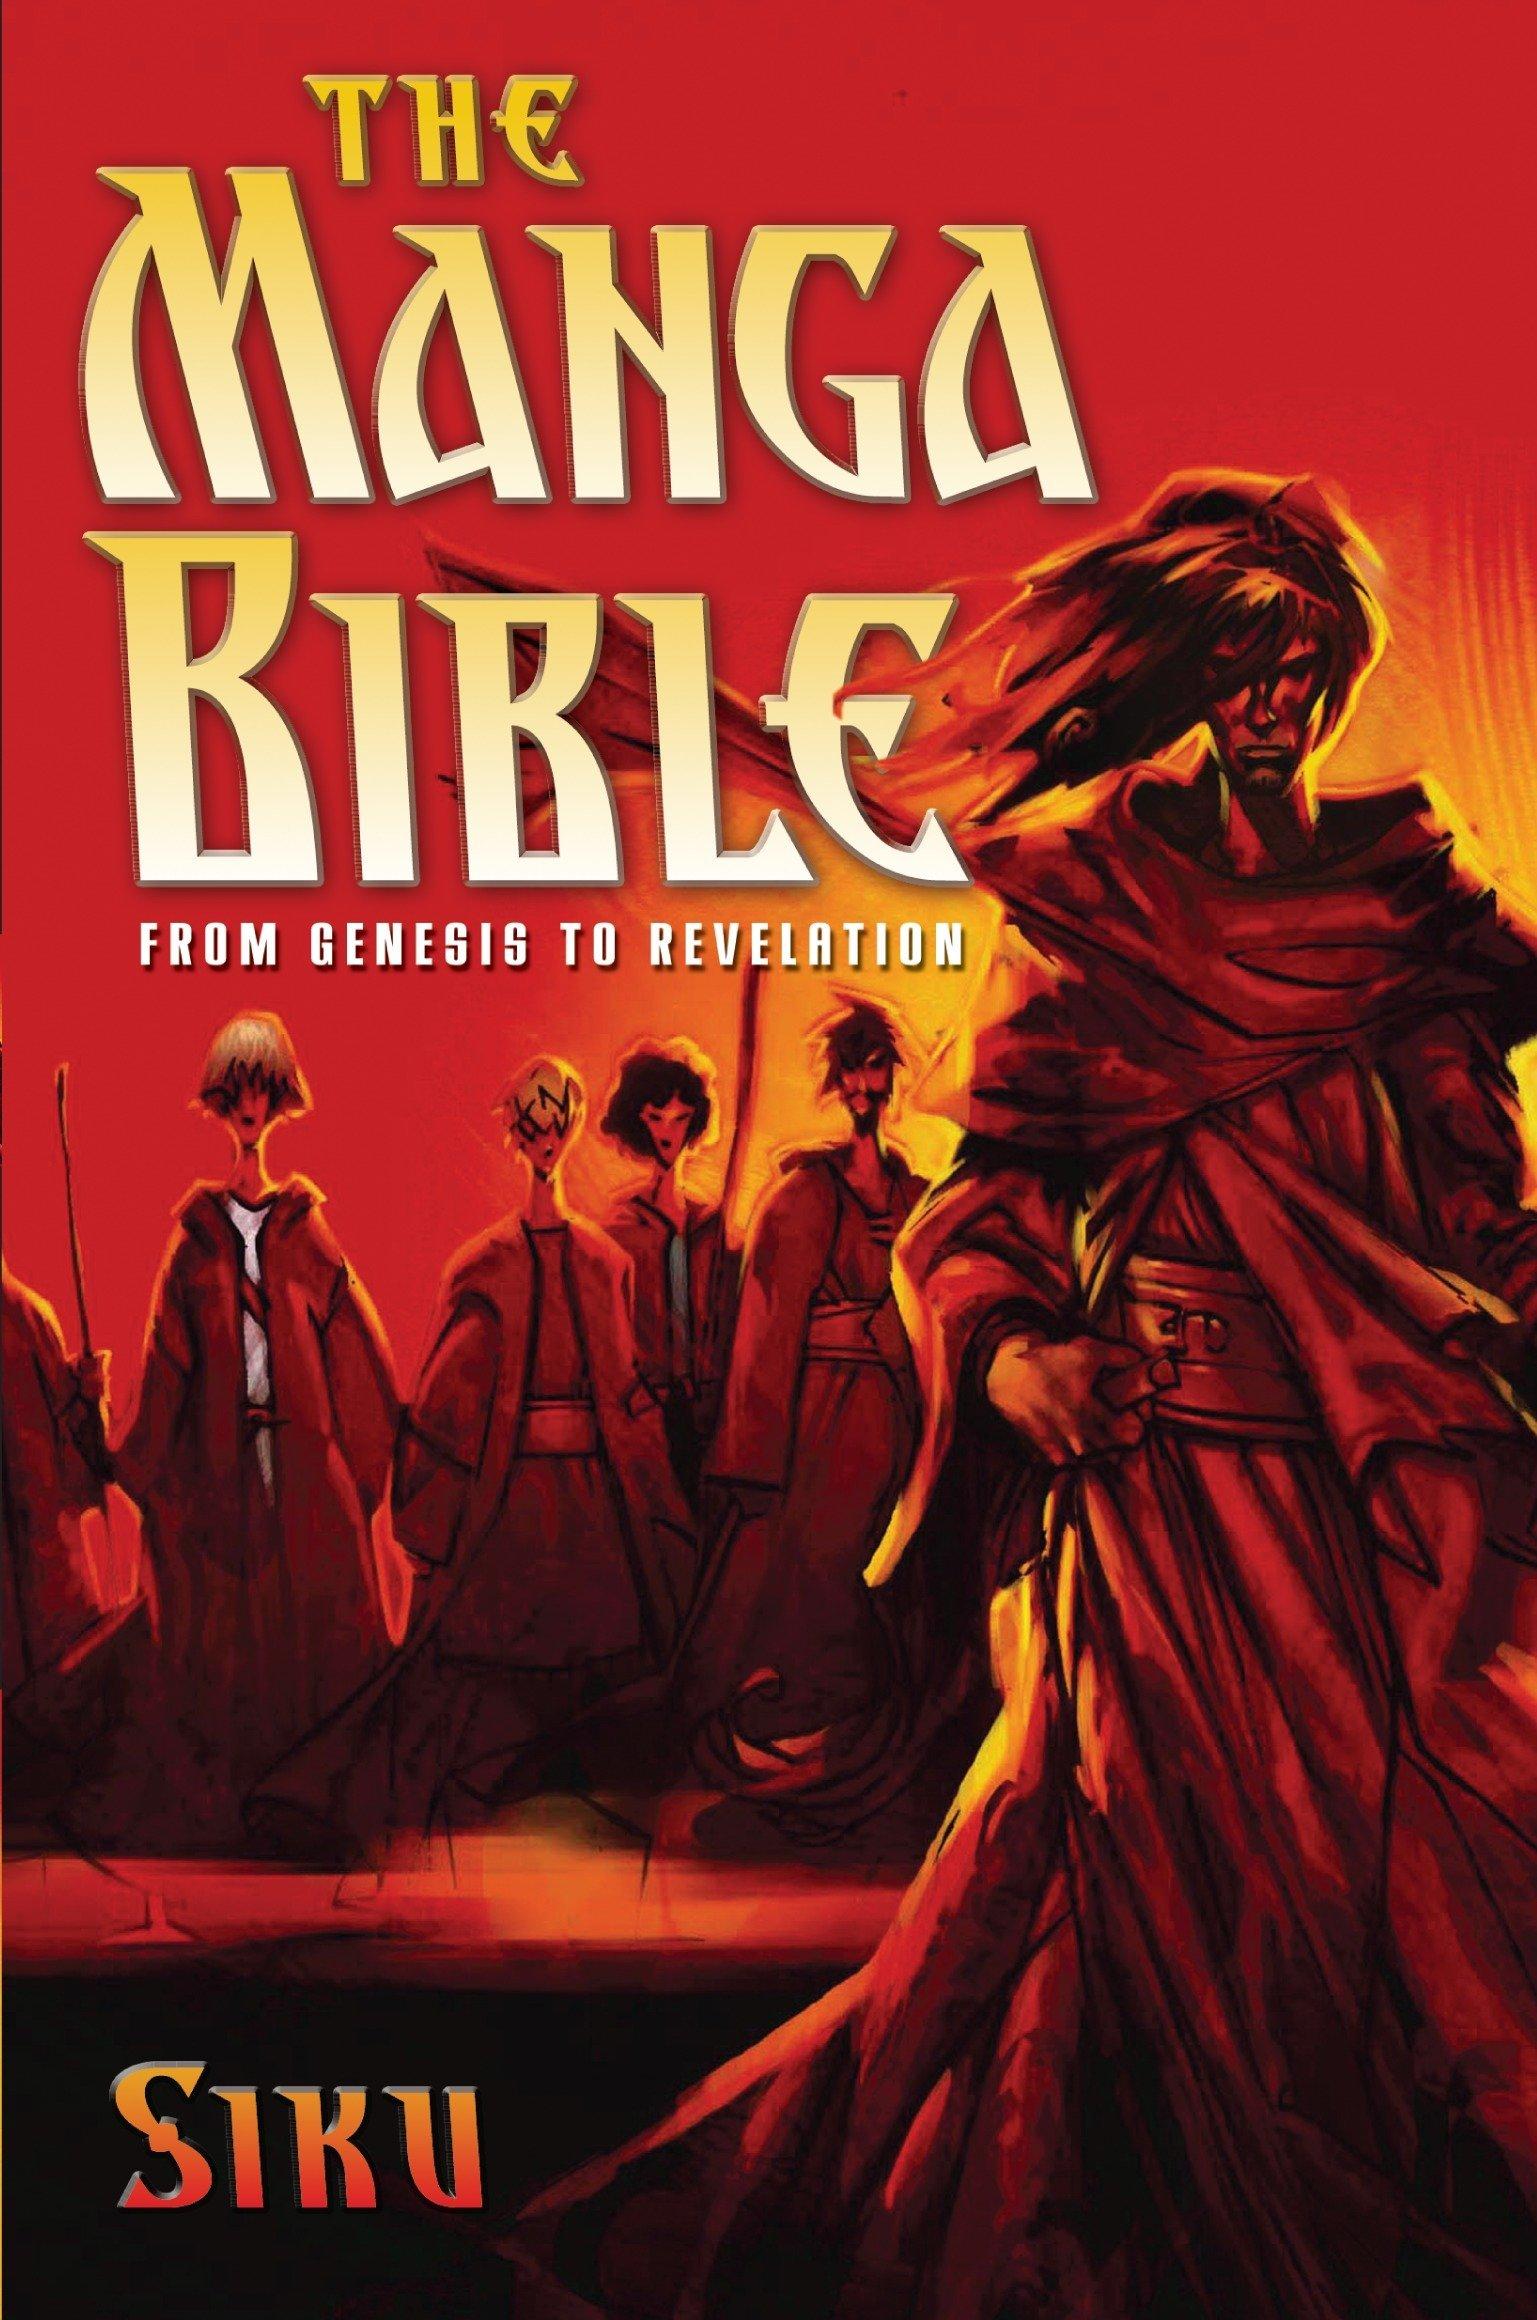 The Manga Bible: From Genesis to Revelation: Siku